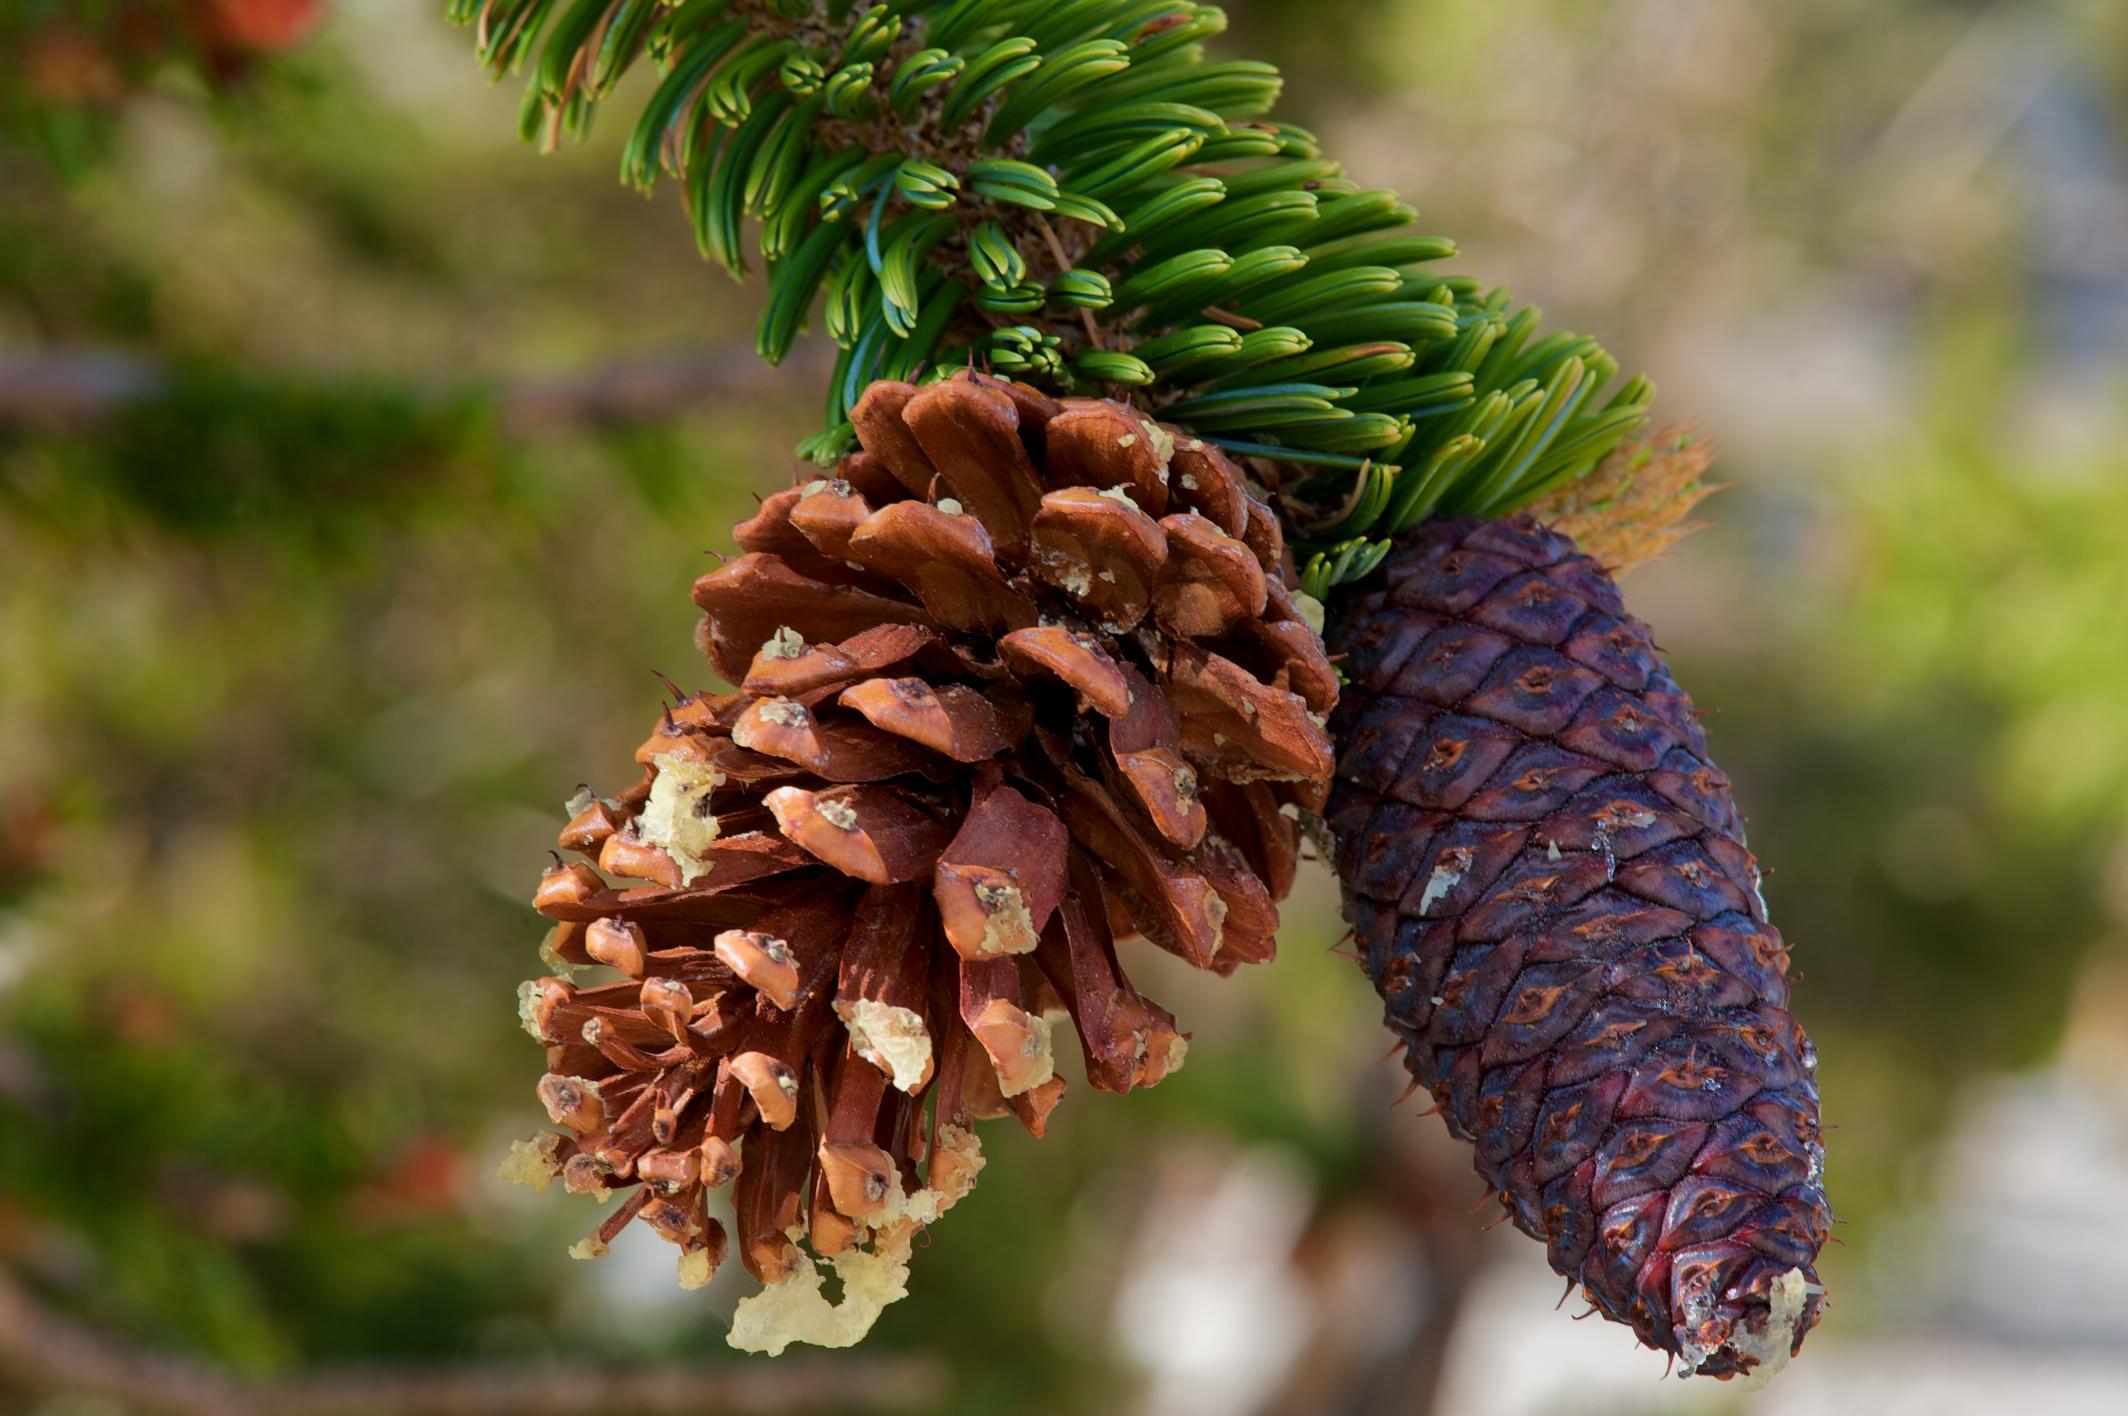 6486 Female Bristlecone Pine Cones.jpg